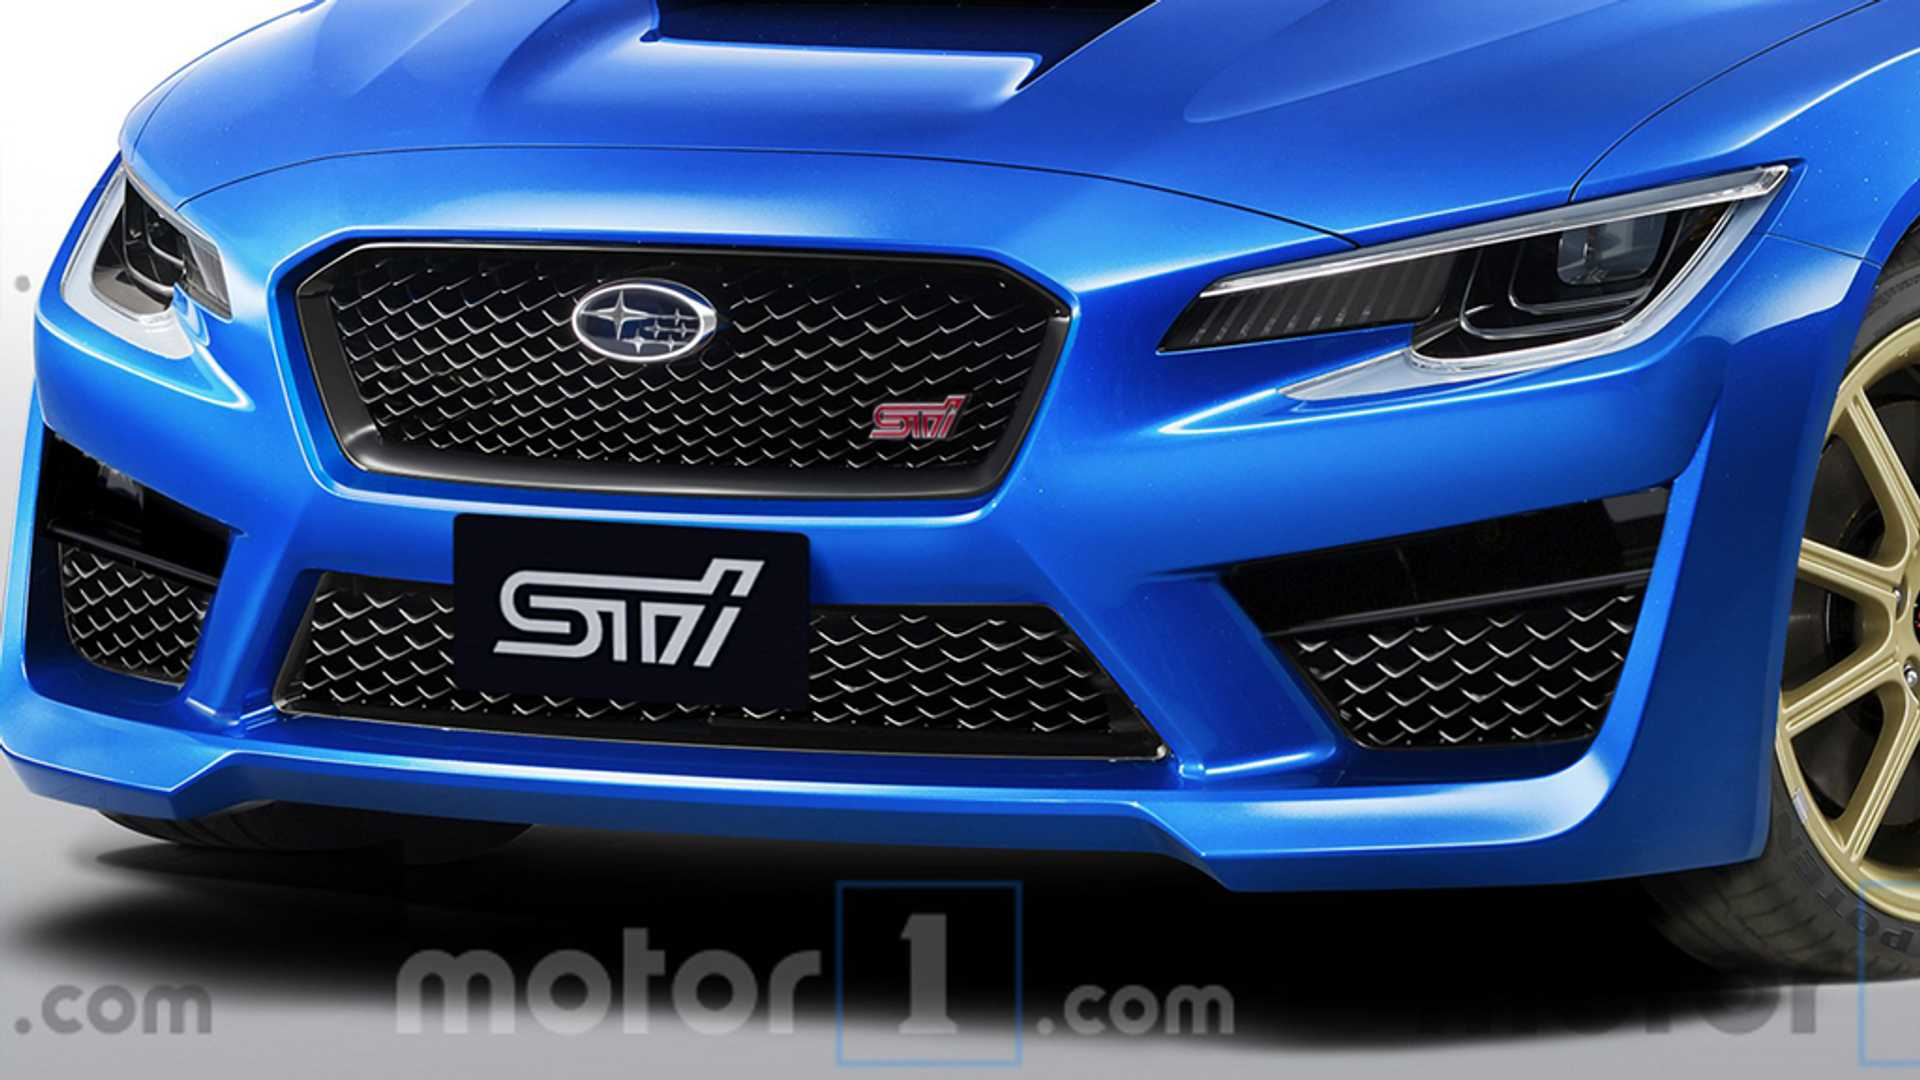 78 Best Review Subaru Wrx 2020 Release Date with Subaru Wrx 2020